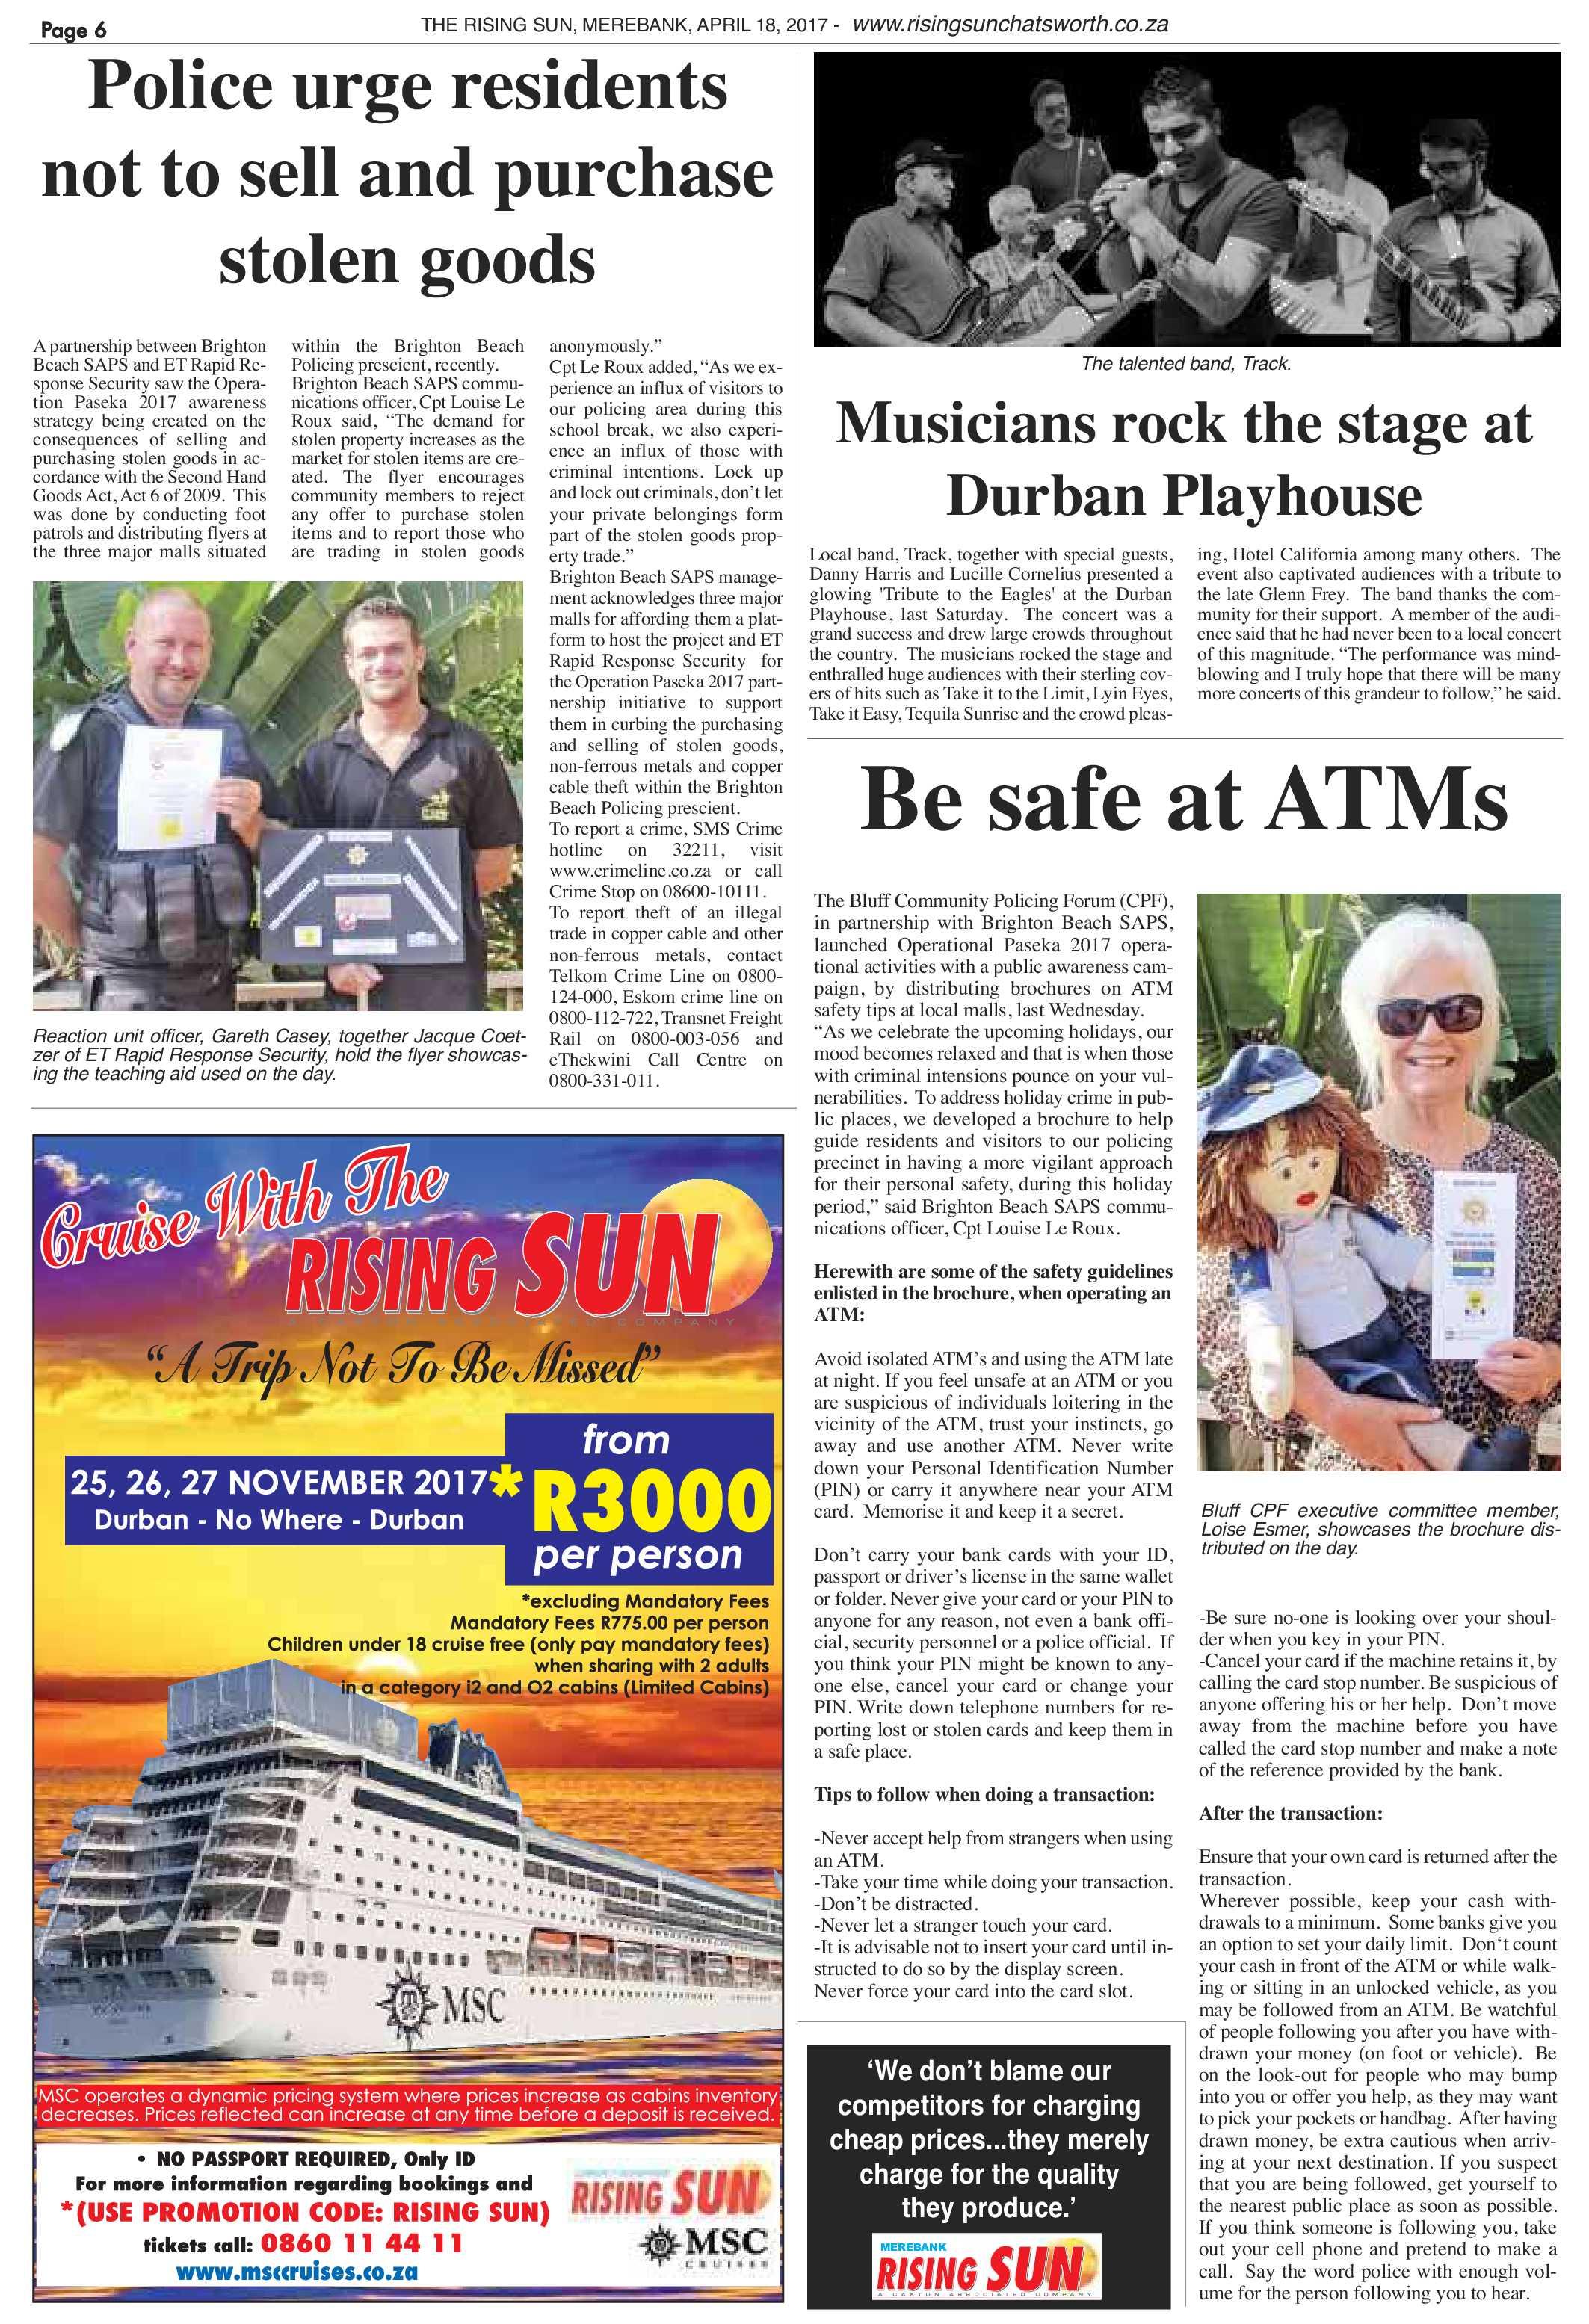 merebank-april-18-epapers-page-6